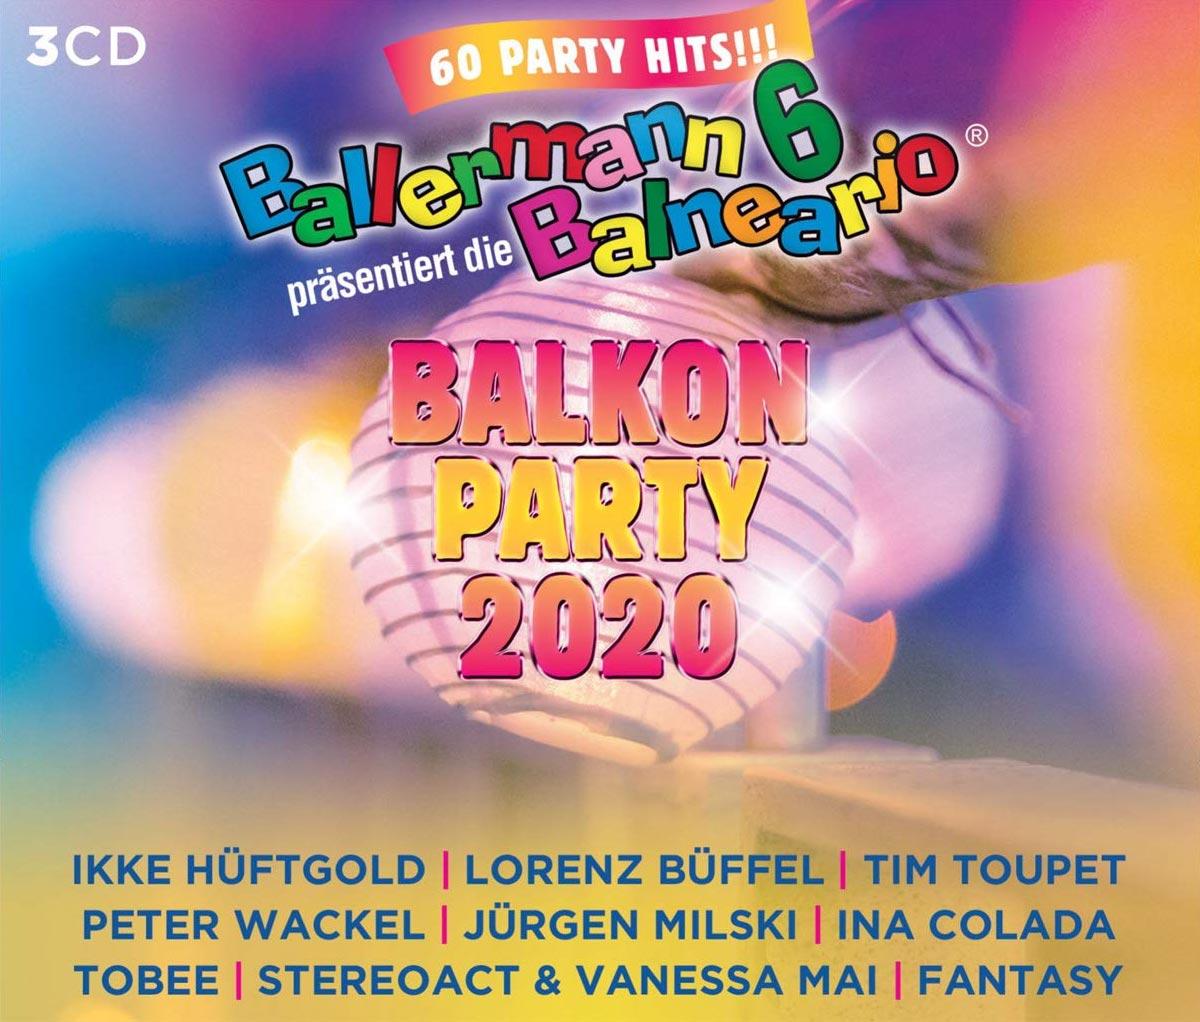 BALLERMANN 6 BALNEARIO PRÄS. DIE BALKON PARTY 2020